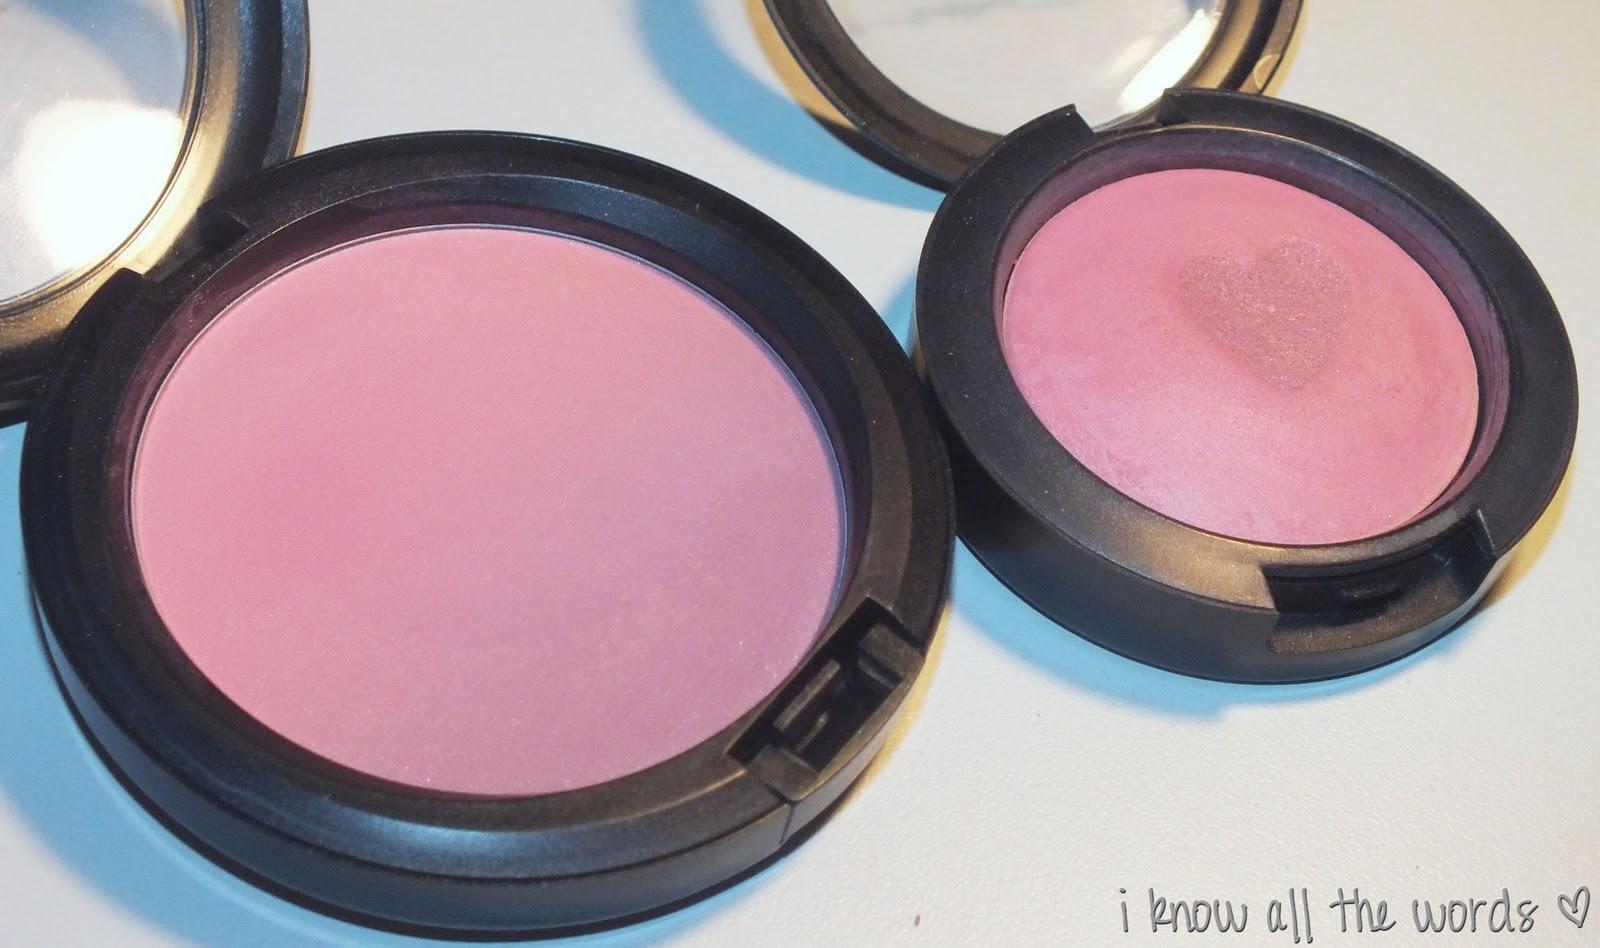 mac azalea blossom blush - photo #11